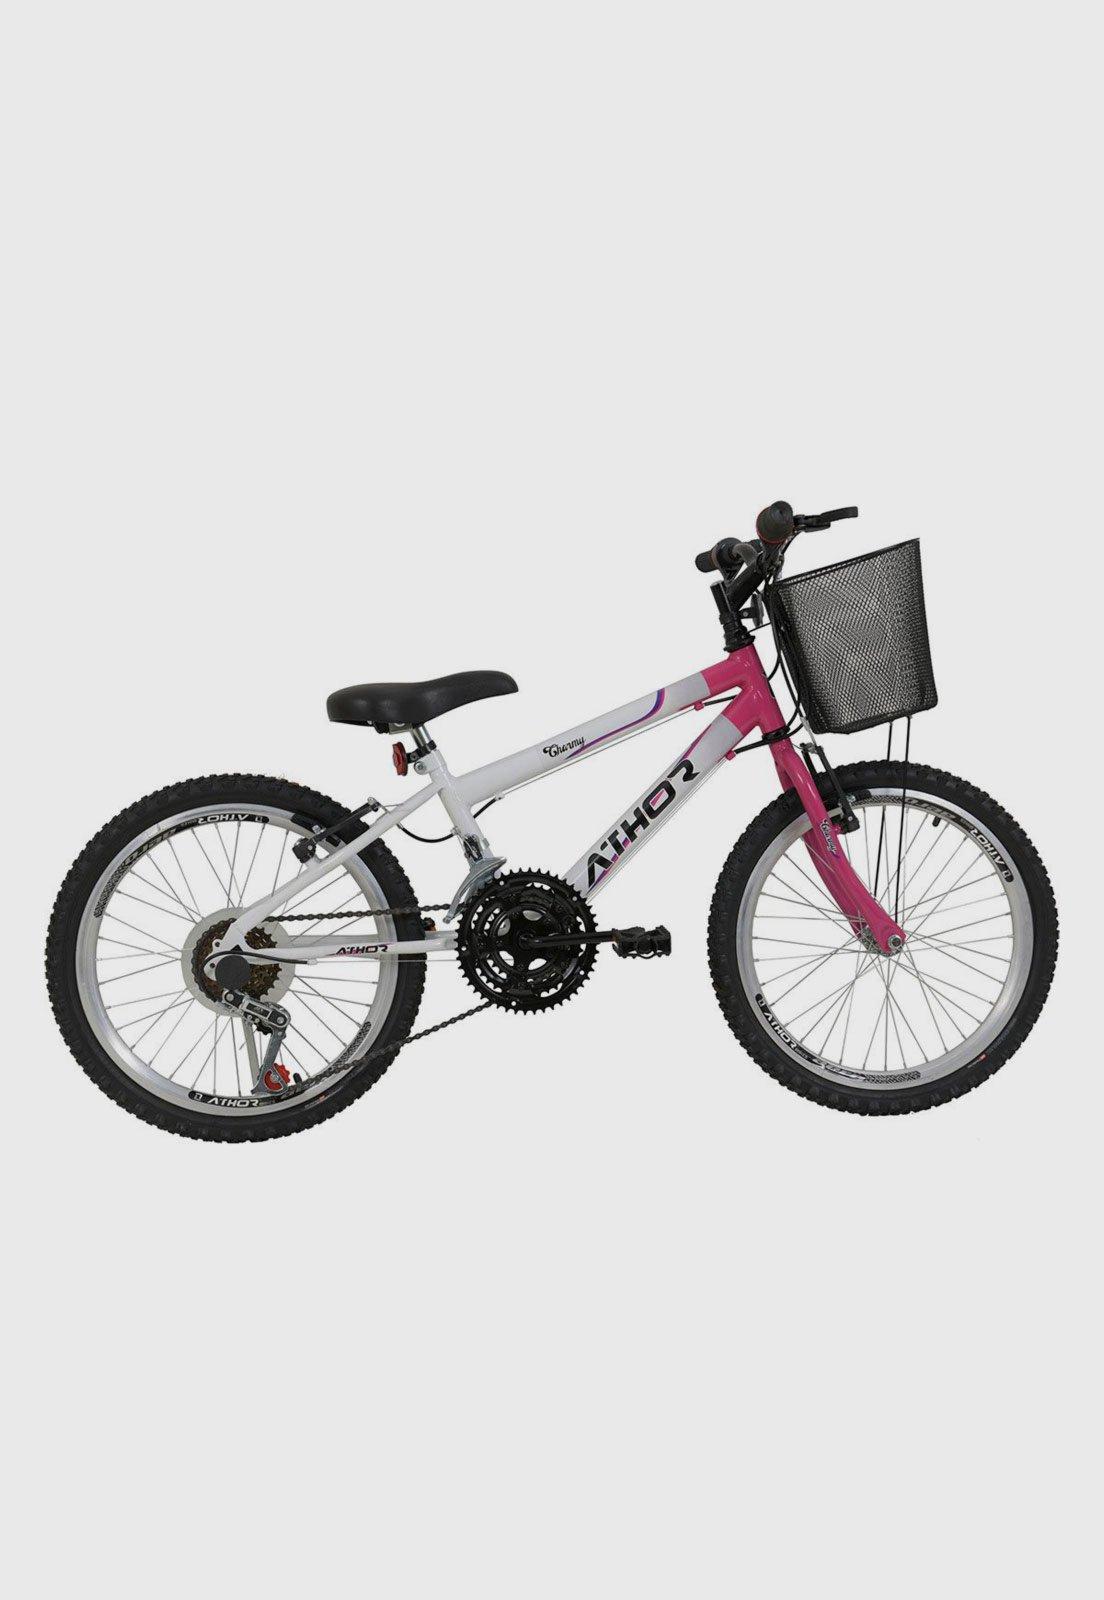 Bicicleta Athor Bike Charme Aro 20 Rígida 18 Marchas - Branco/rosa